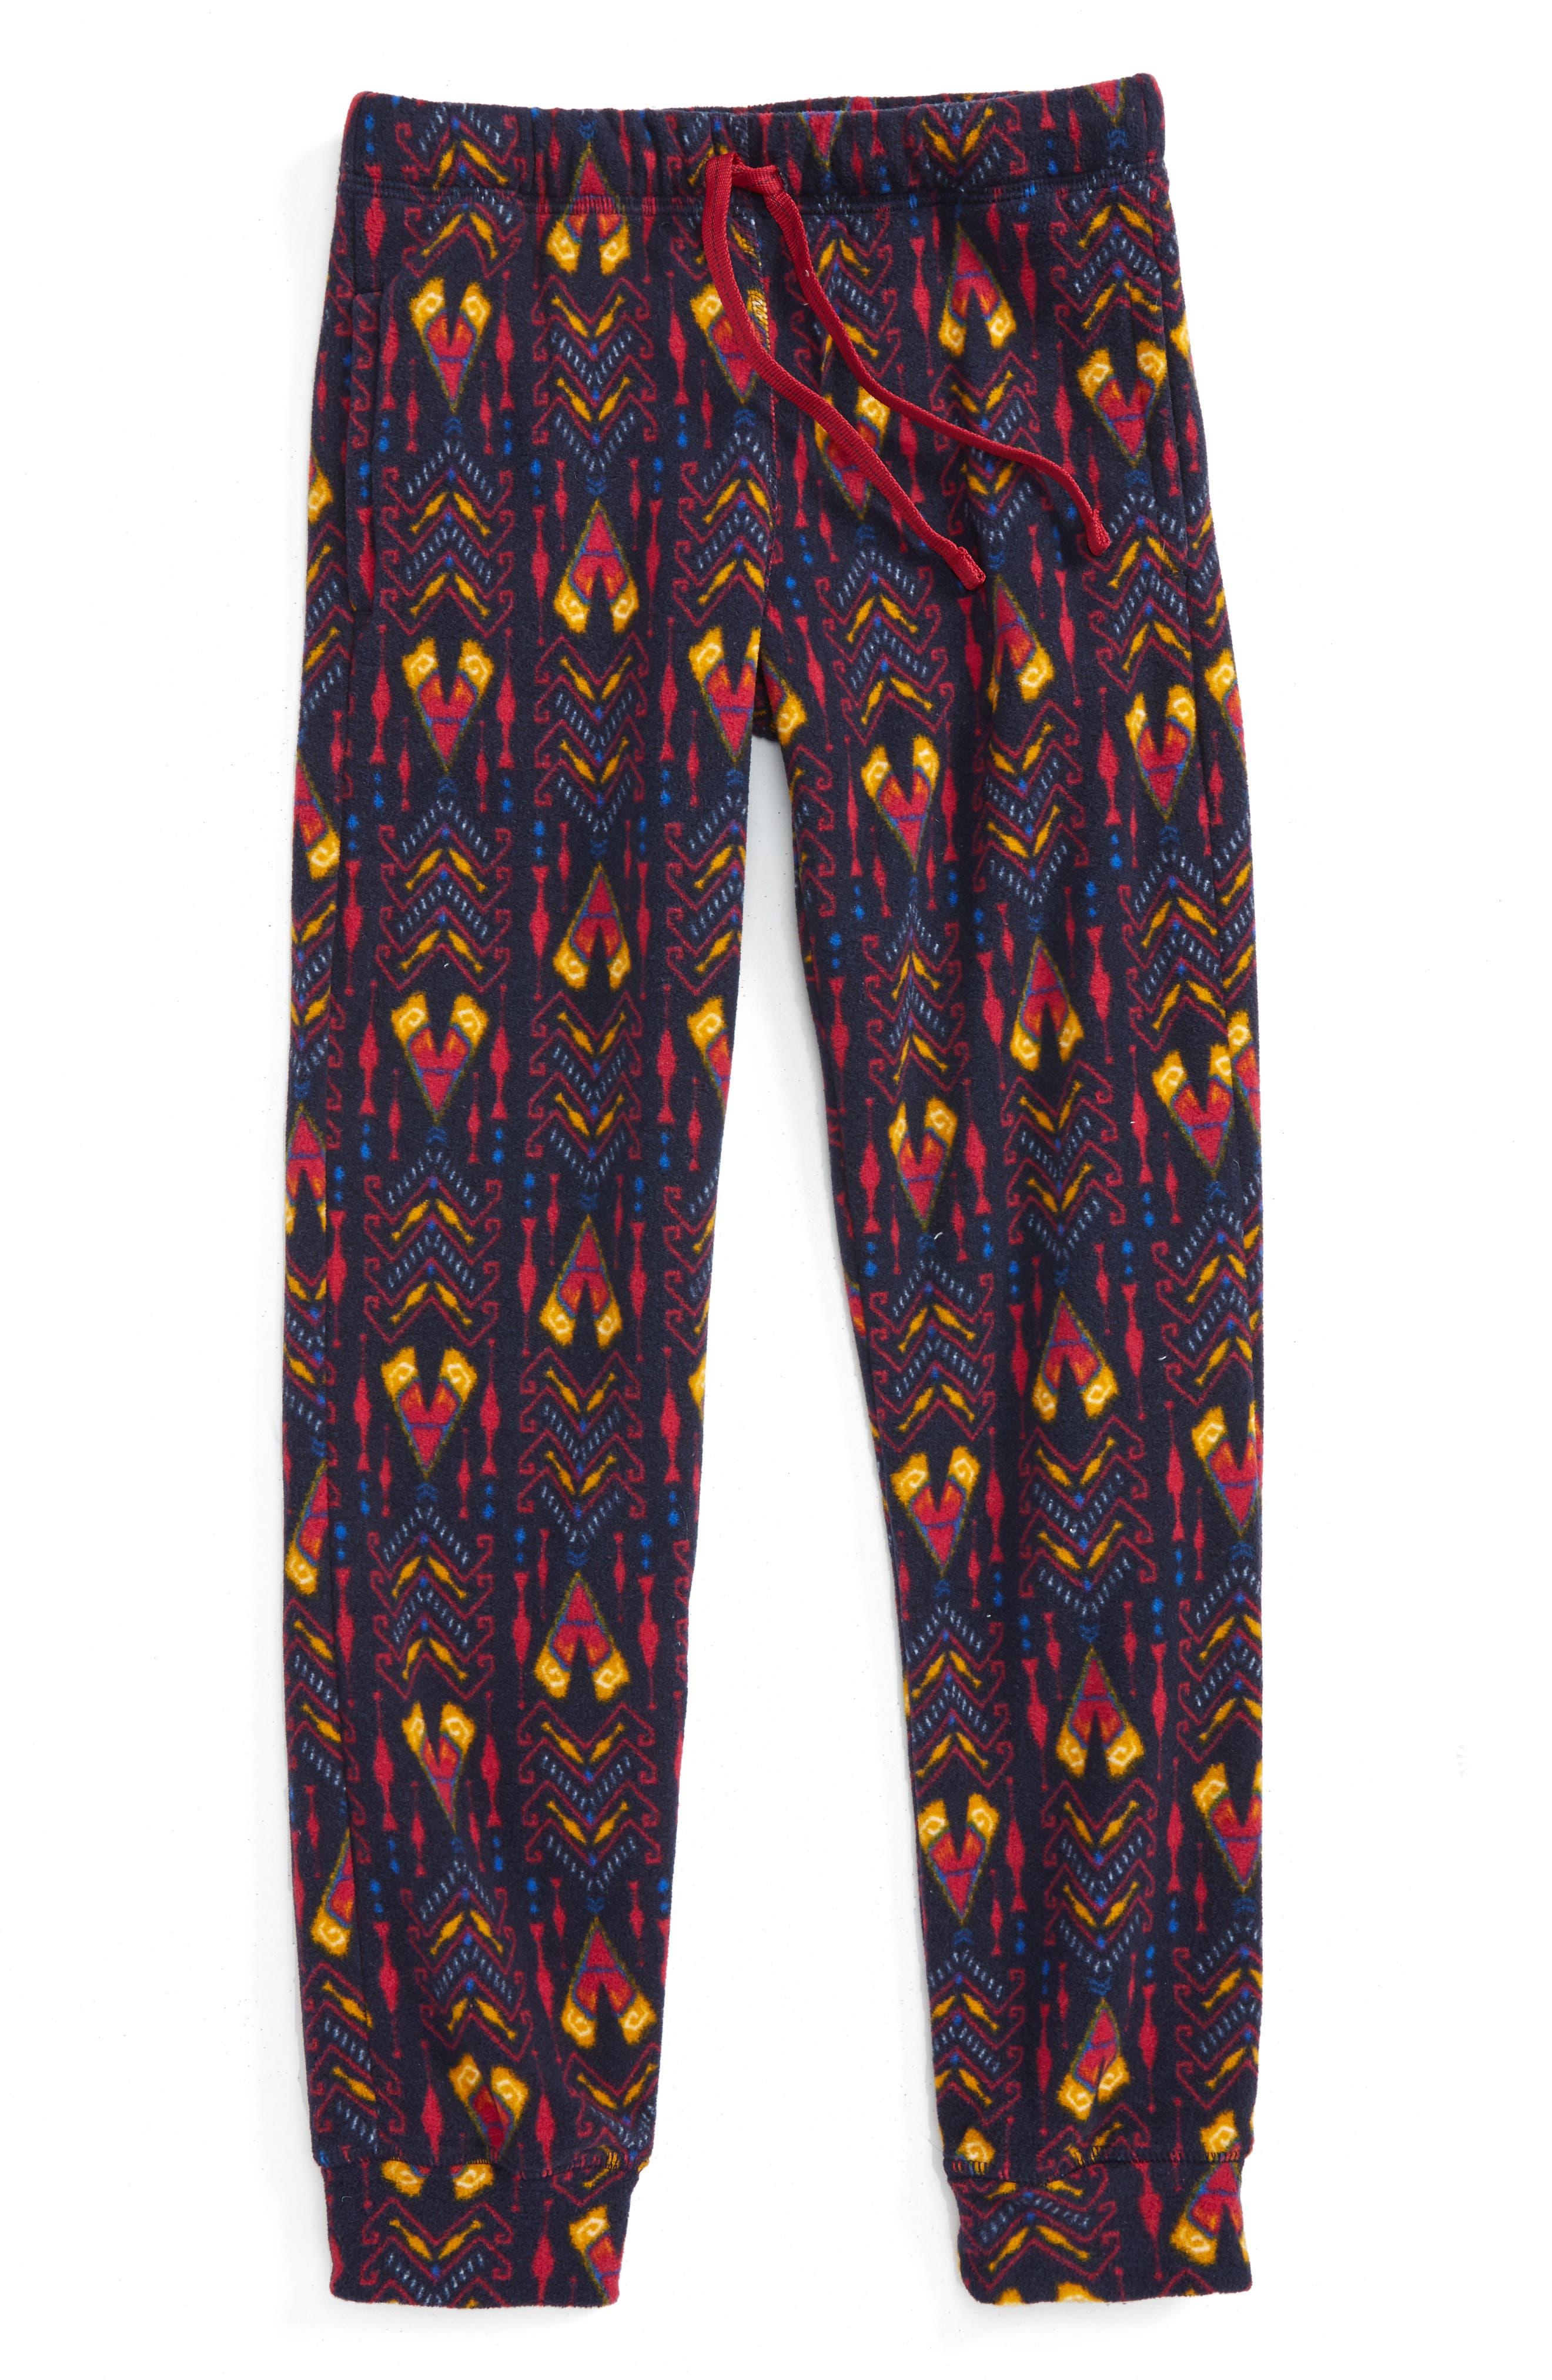 Alternate Image 1 Selected - Patagonia Micro D® Fleece Pants (Little Girls & Big Girls)